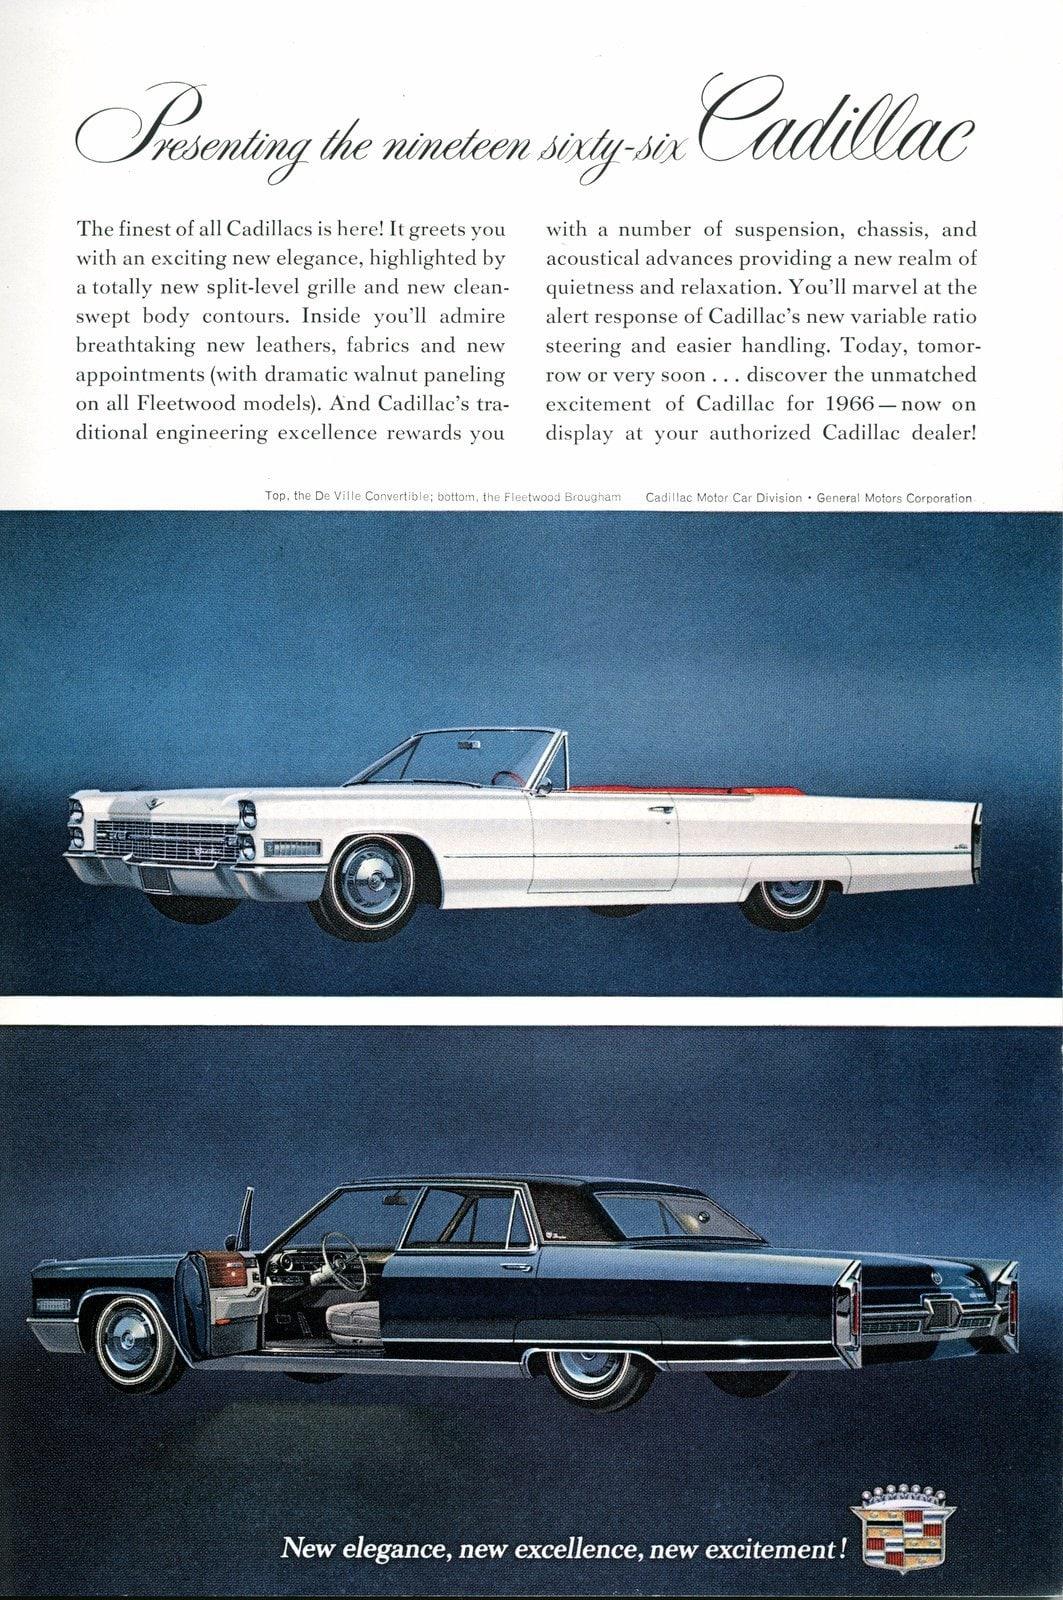 1966 Cadillac cars